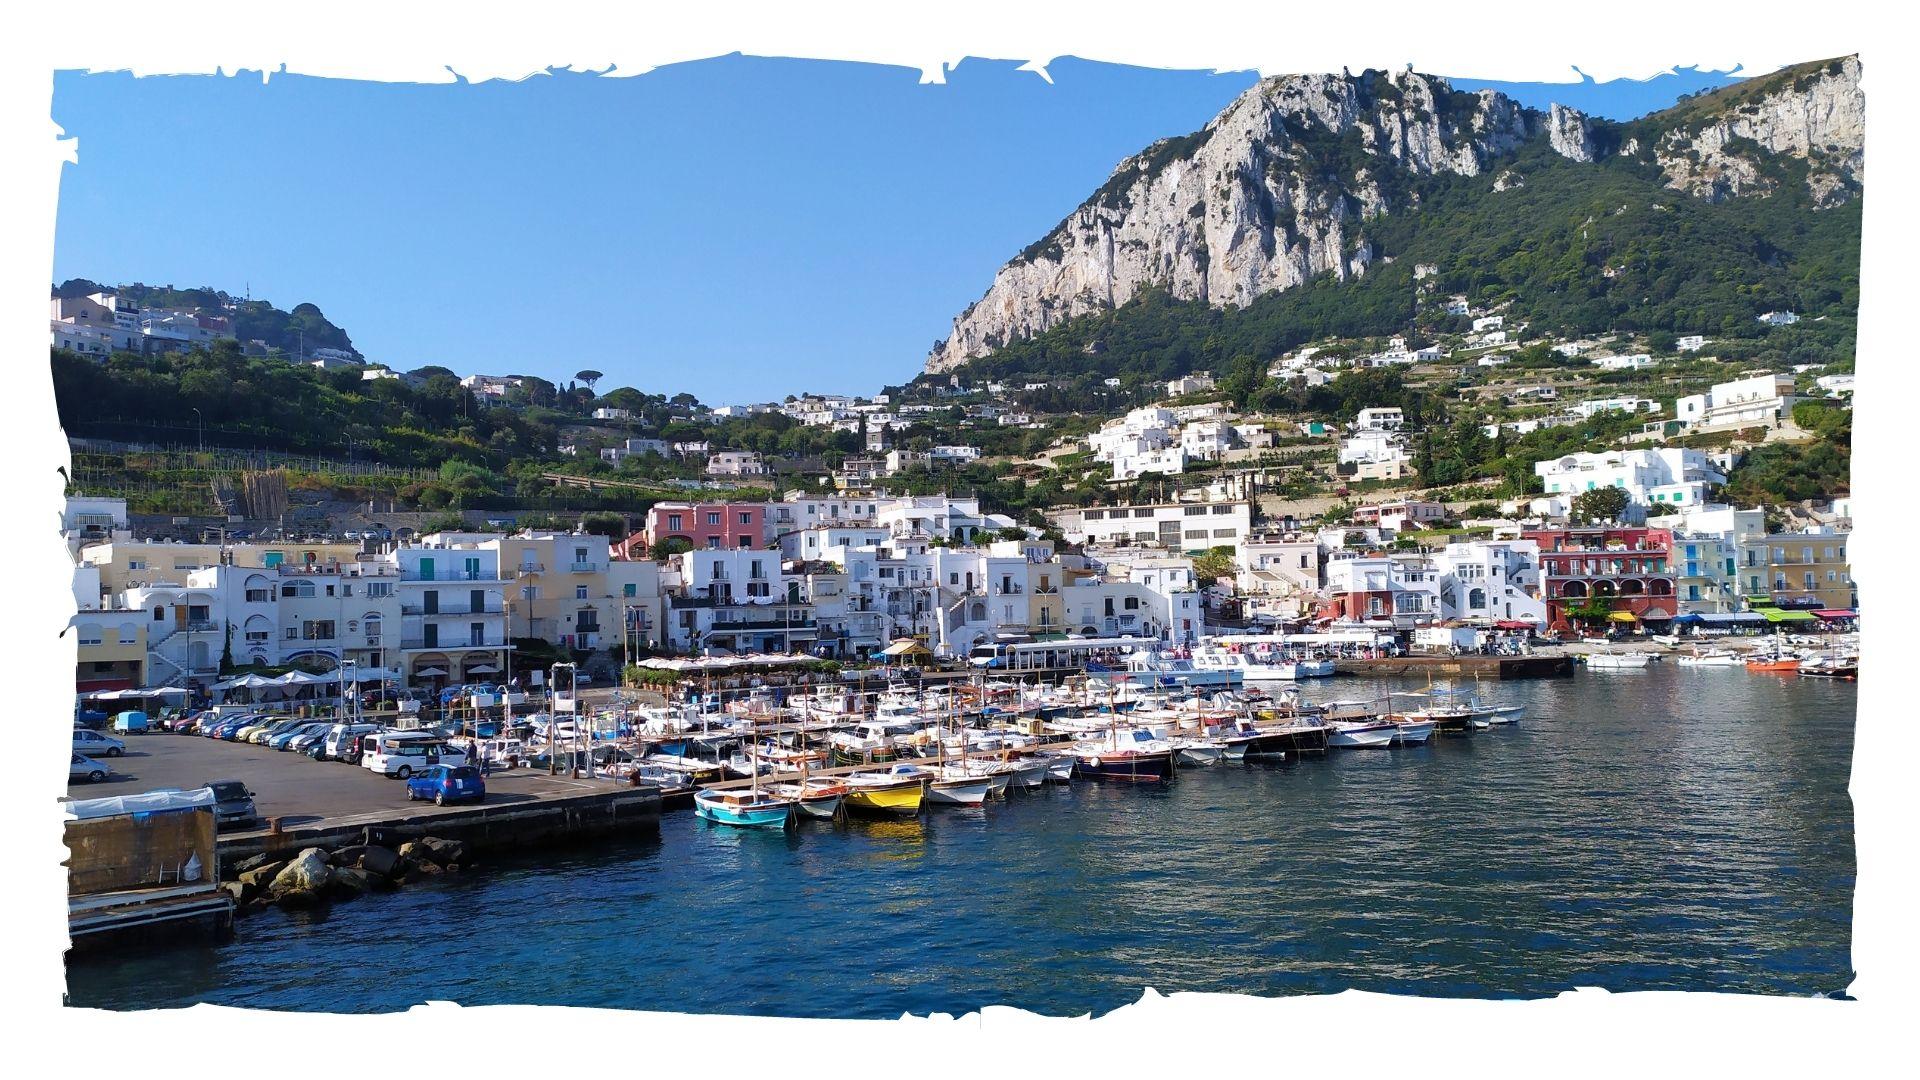 Capri. Storia dell'isola azzurra